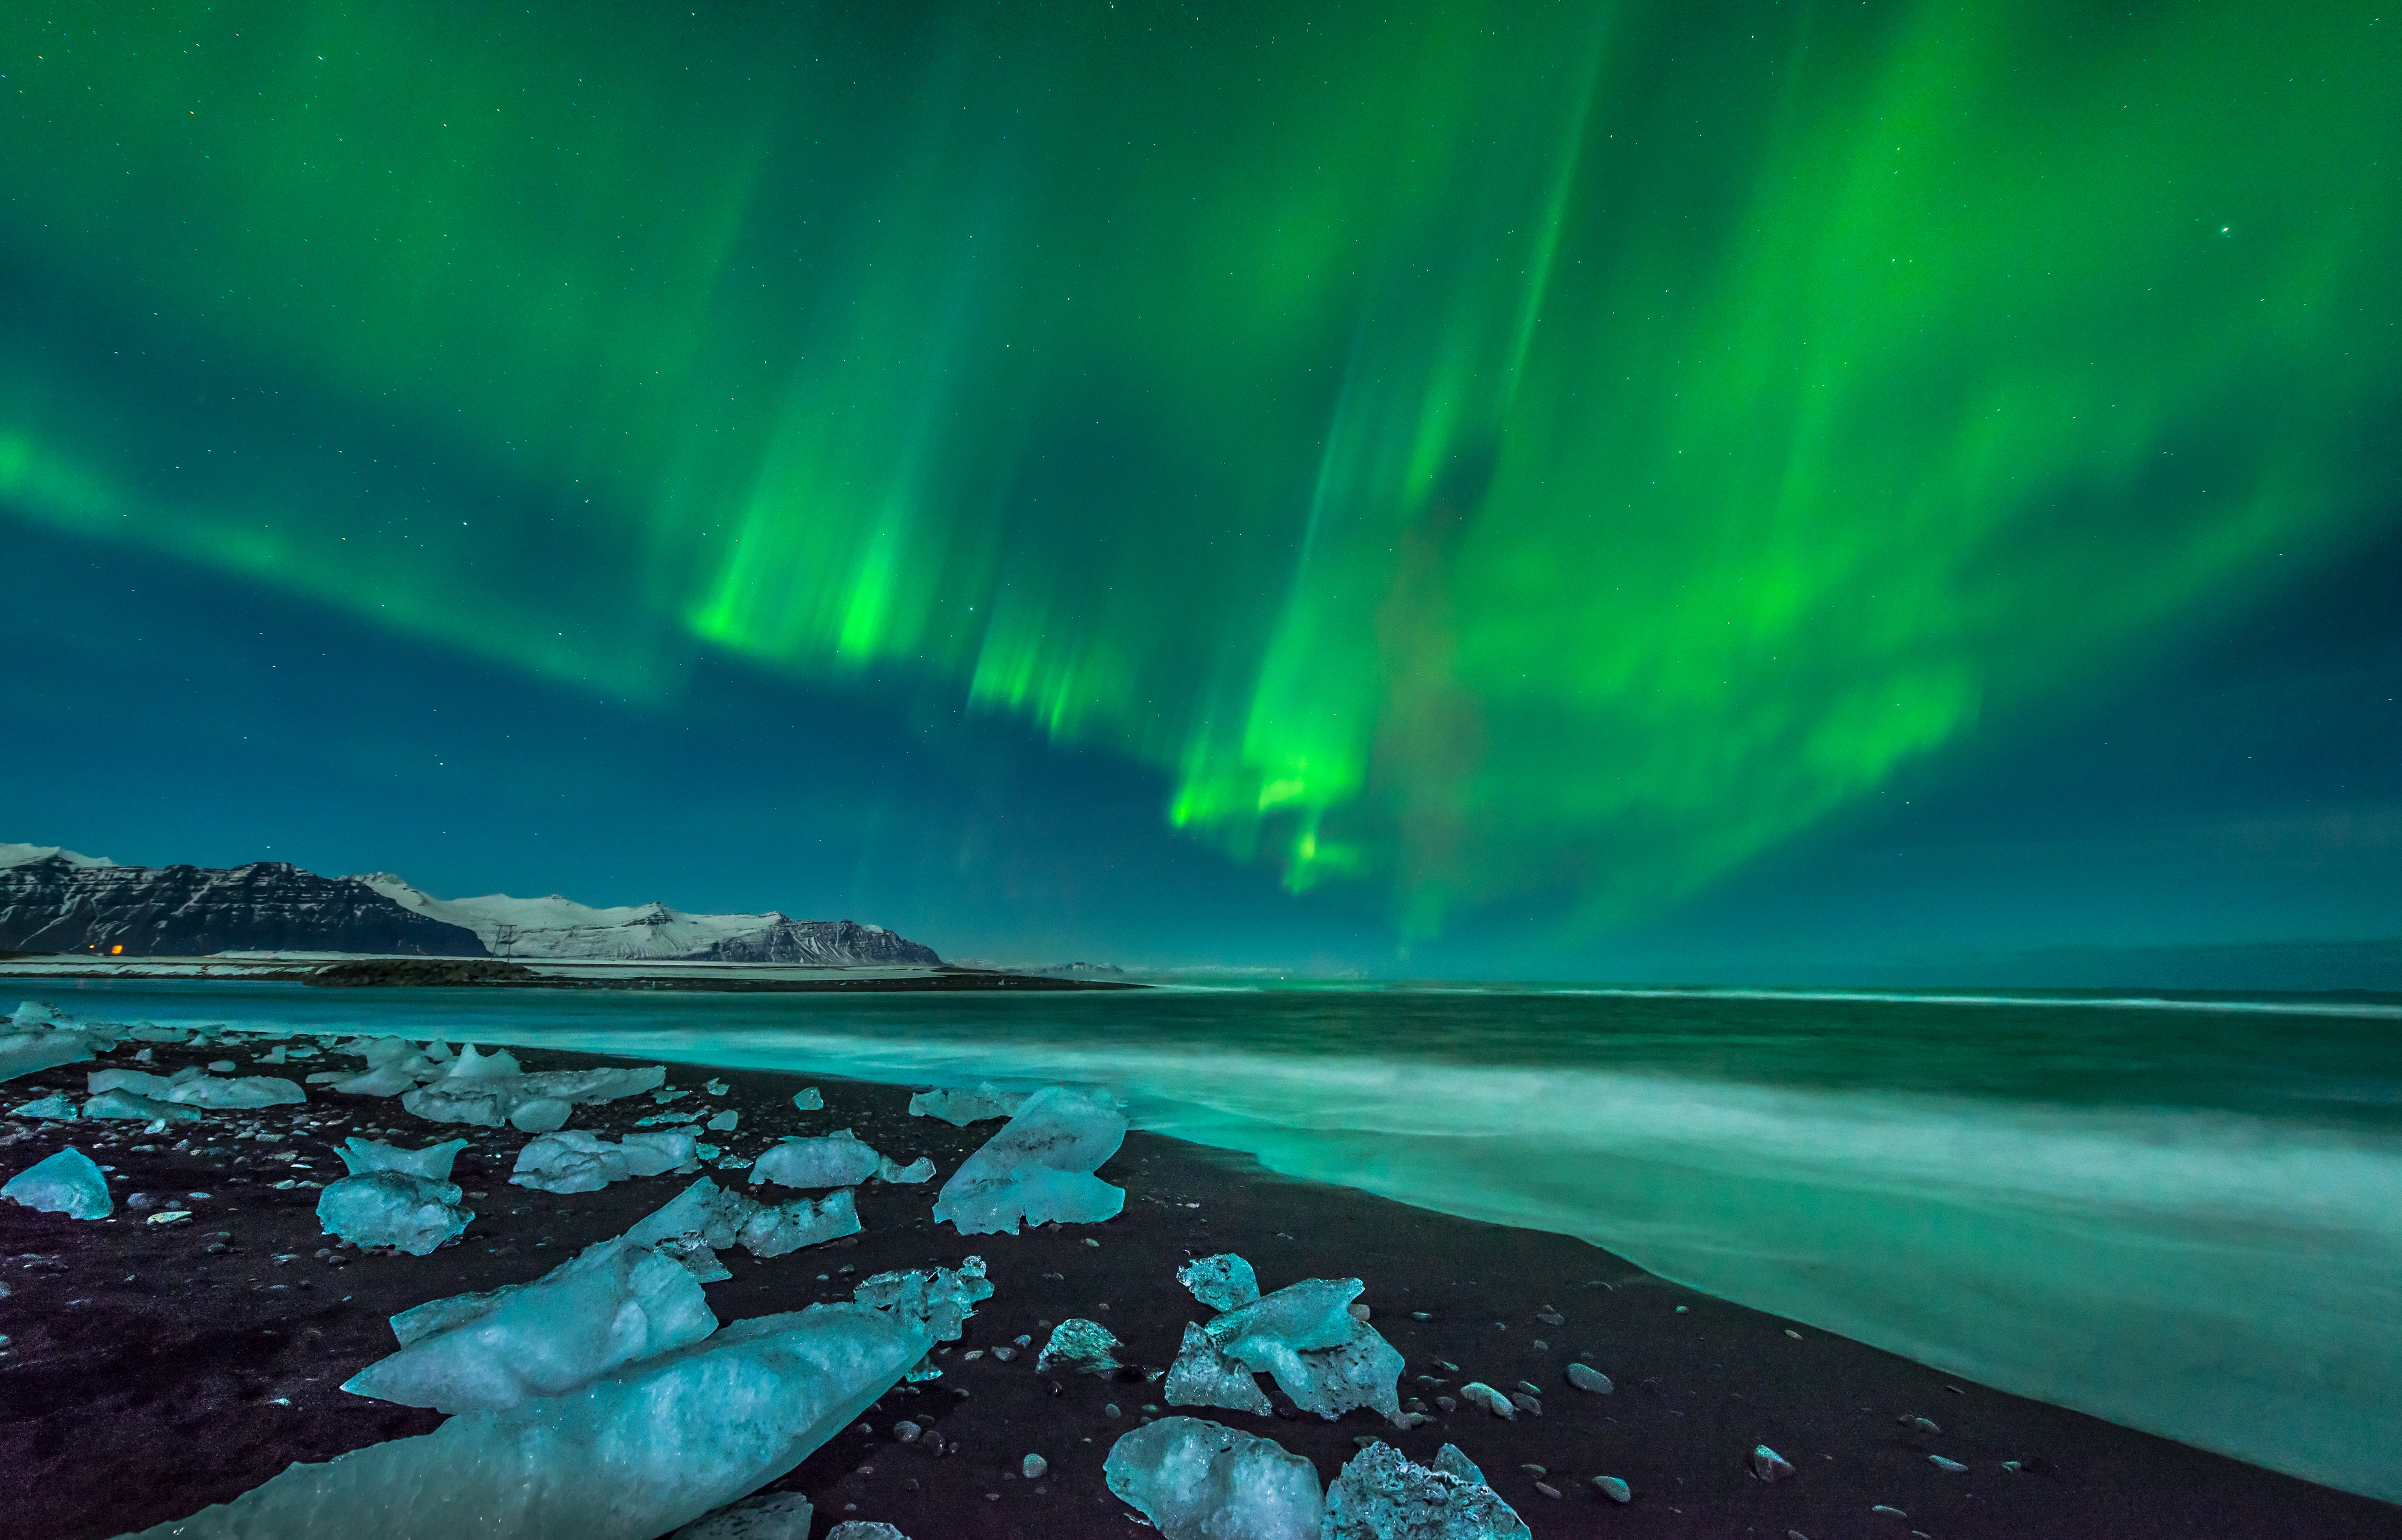 A beautiful aurora display over the ice beach near Jokulsarlon, Iceland. (Photo: Business Wire)